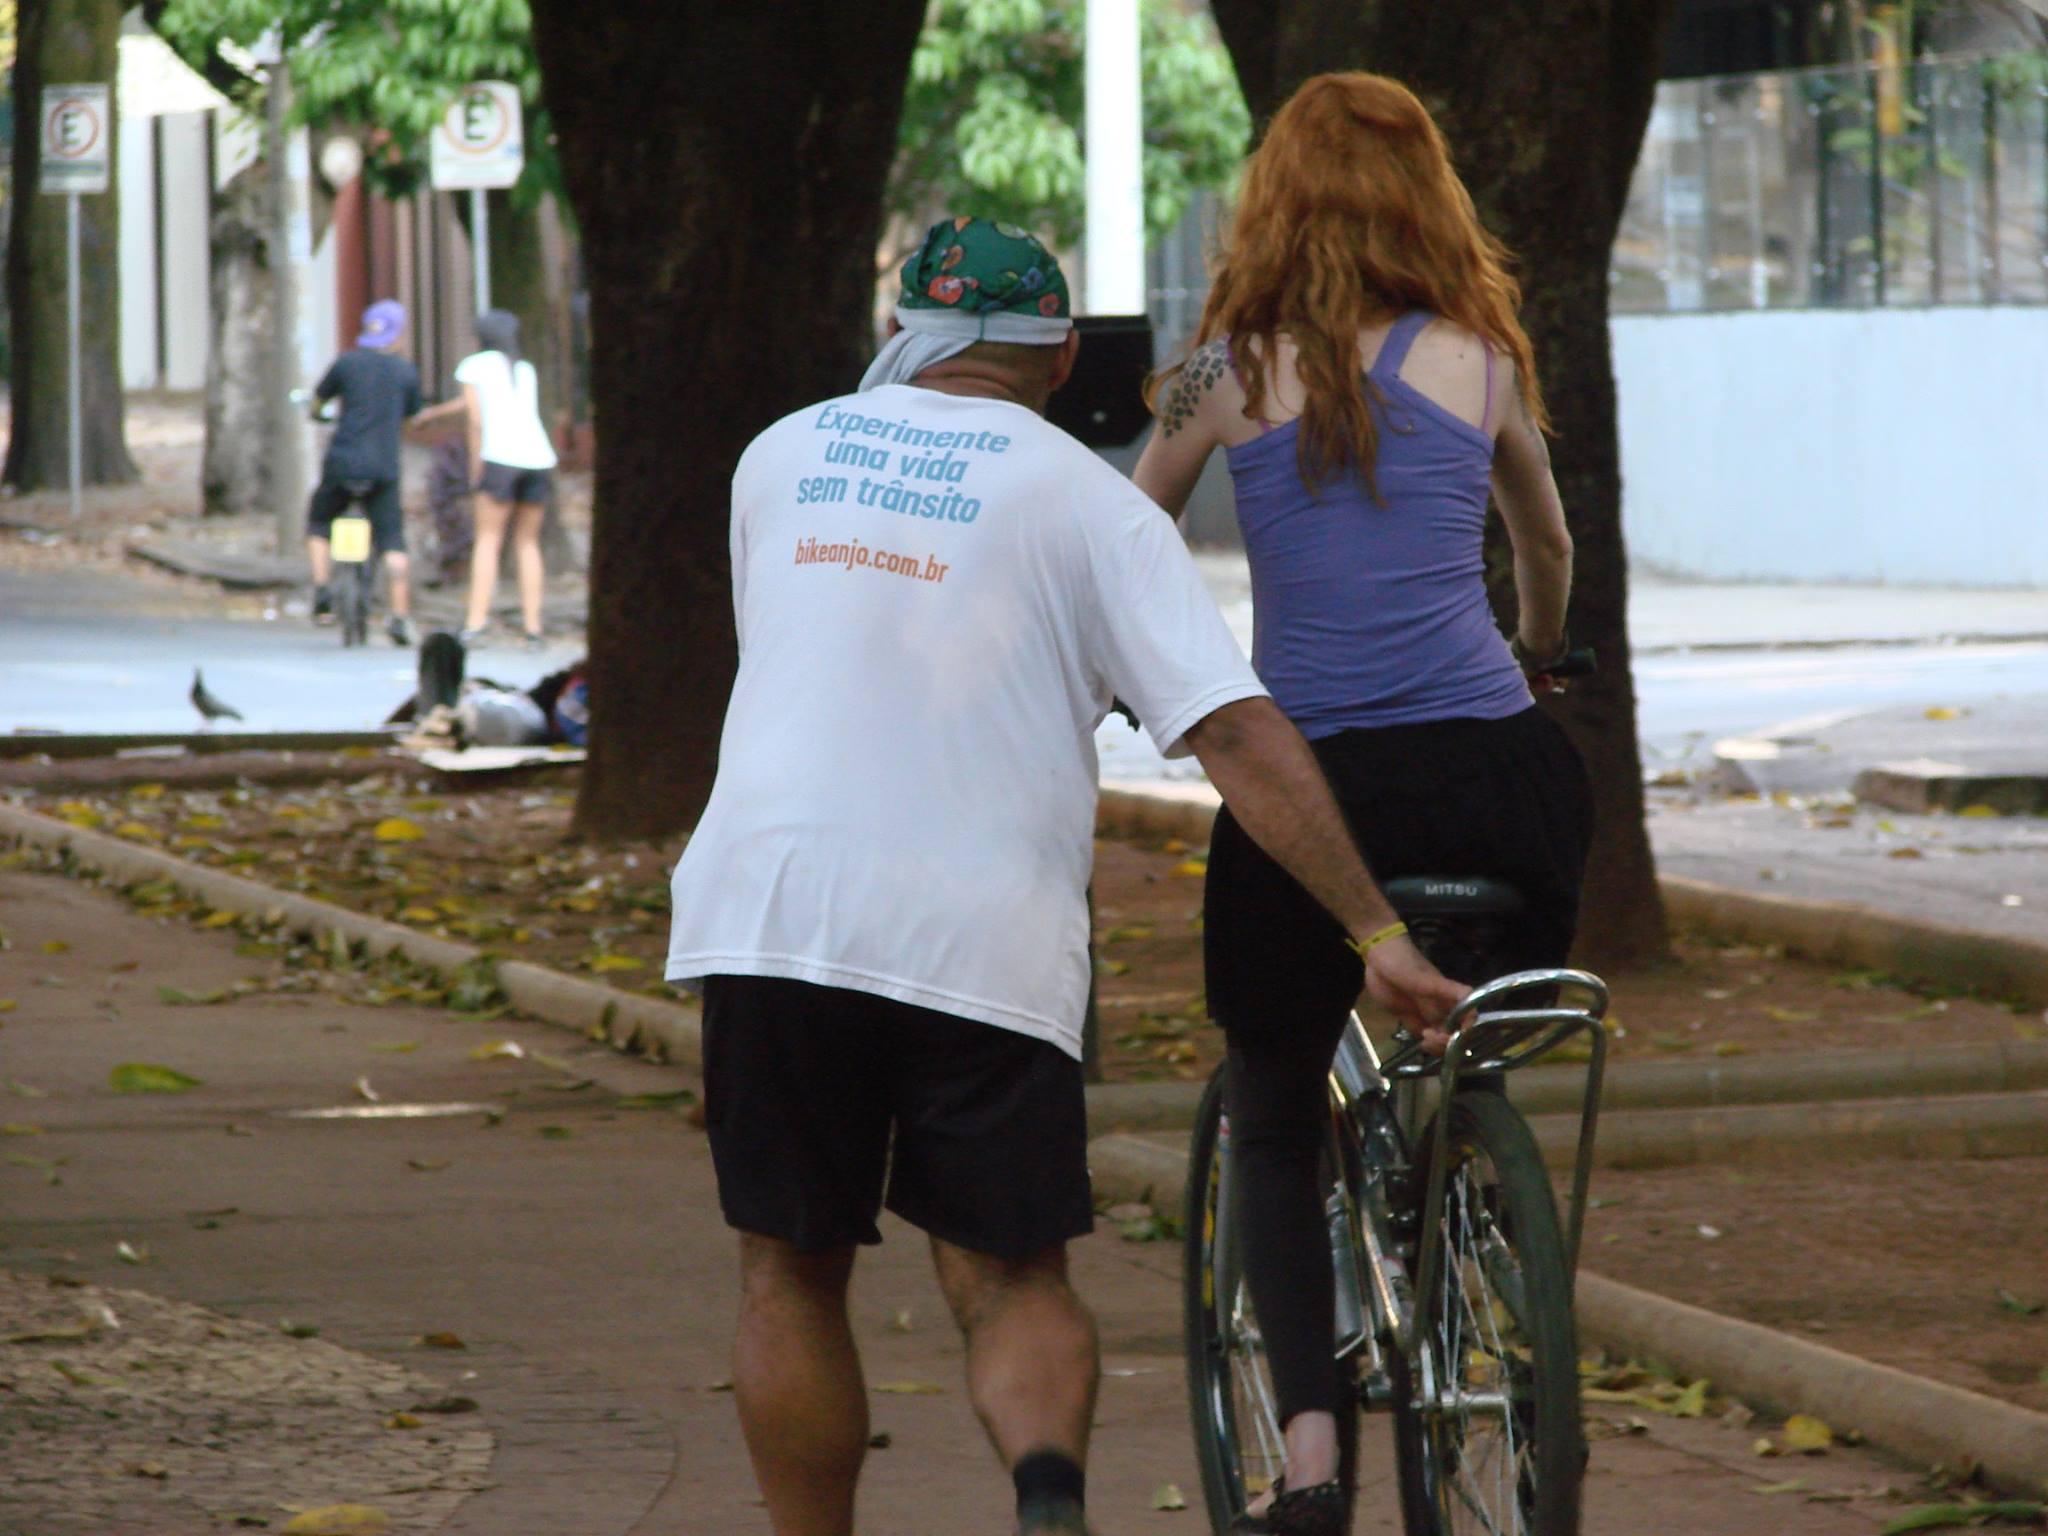 Escola Bike Anjo em Belo Horizonte. Foto: Bike Anjo BH